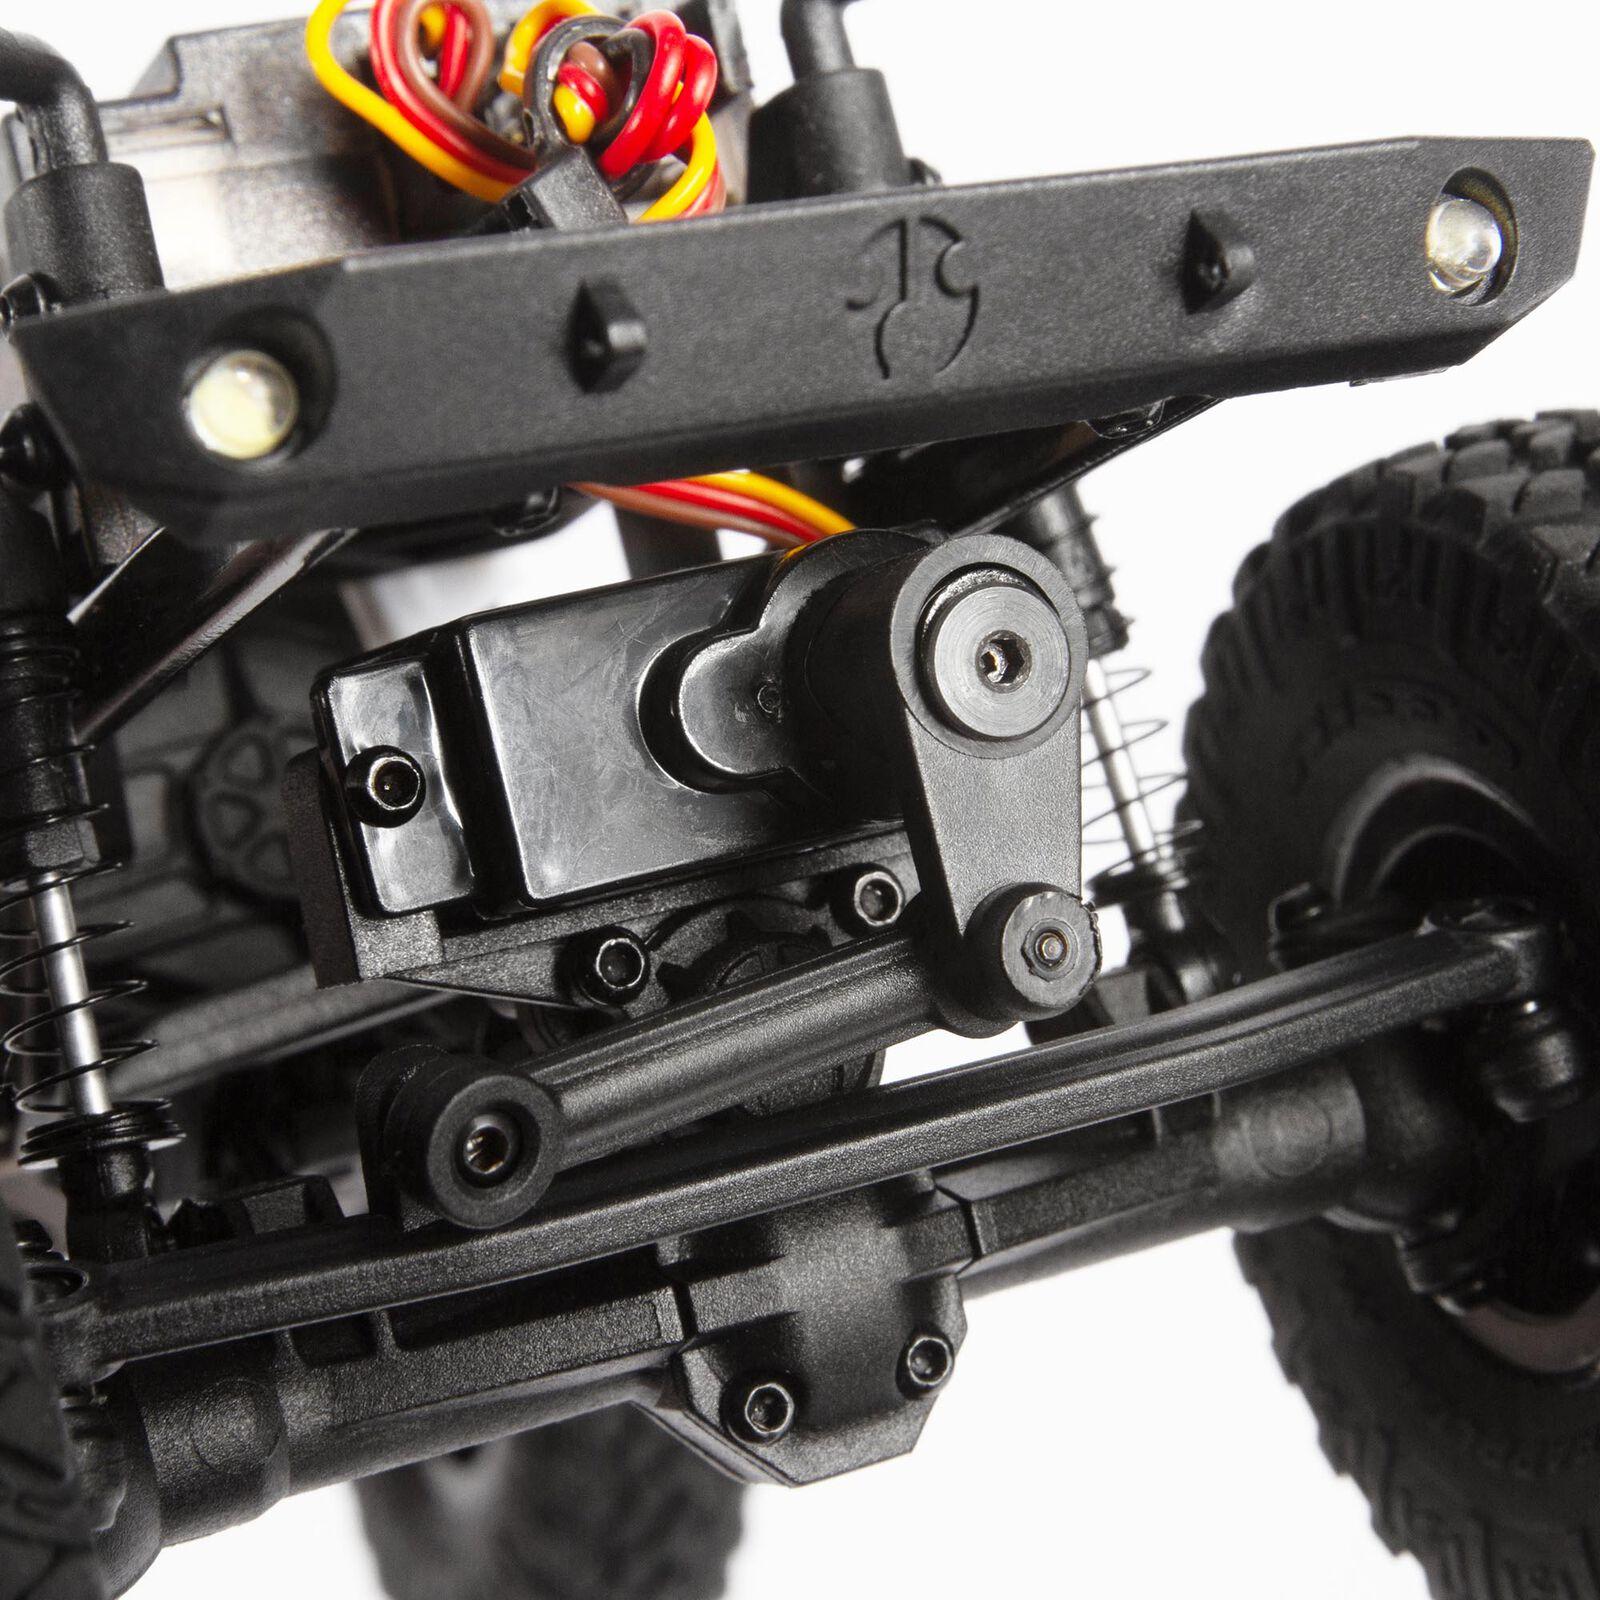 1/24 SCX24 Deadbolt 4WD Rock Crawler Brushed RTR, Red